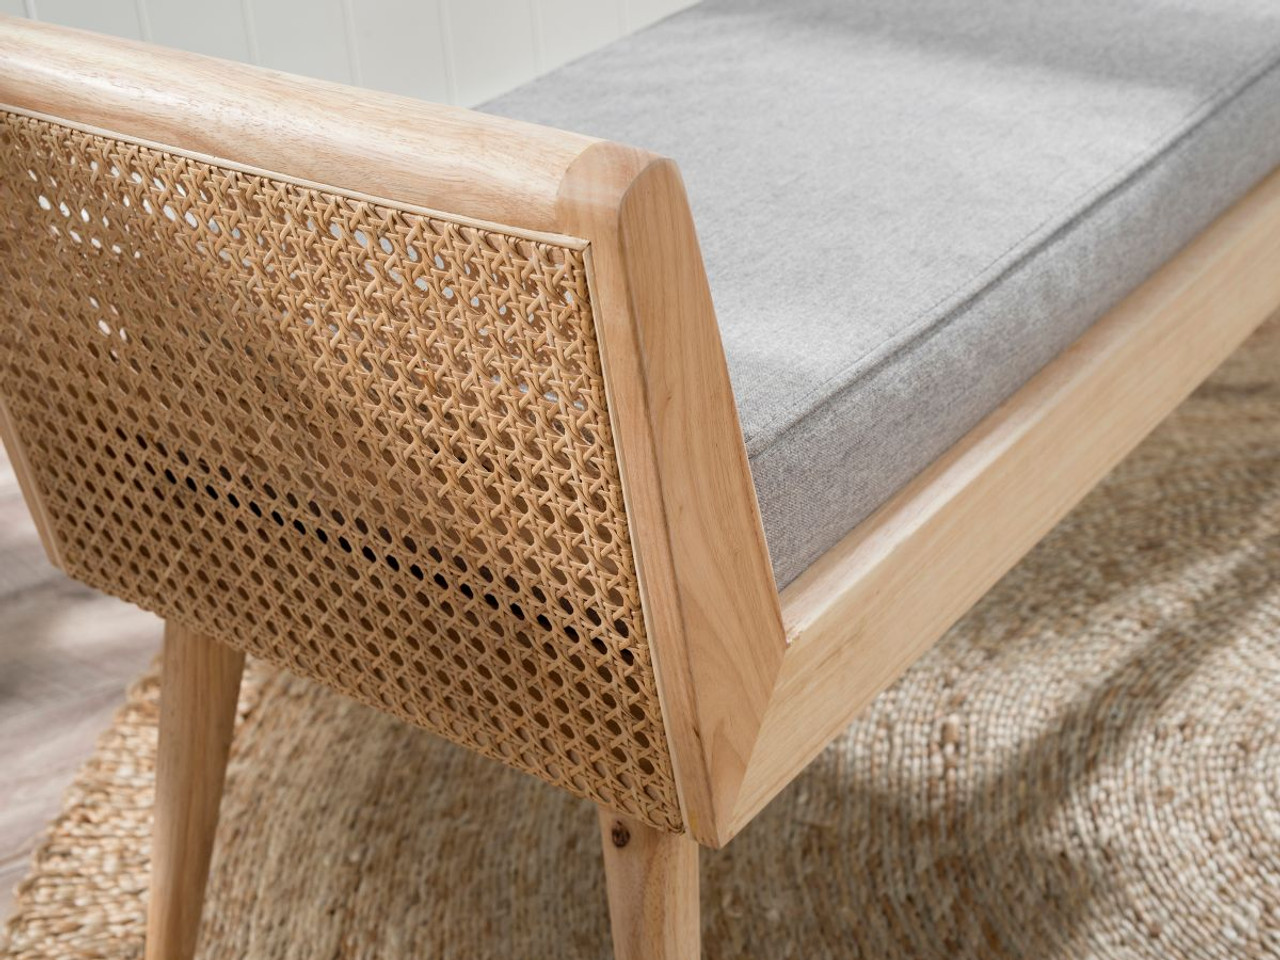 Mocka Innes Rattan Bench Seat Grey Home Furniture